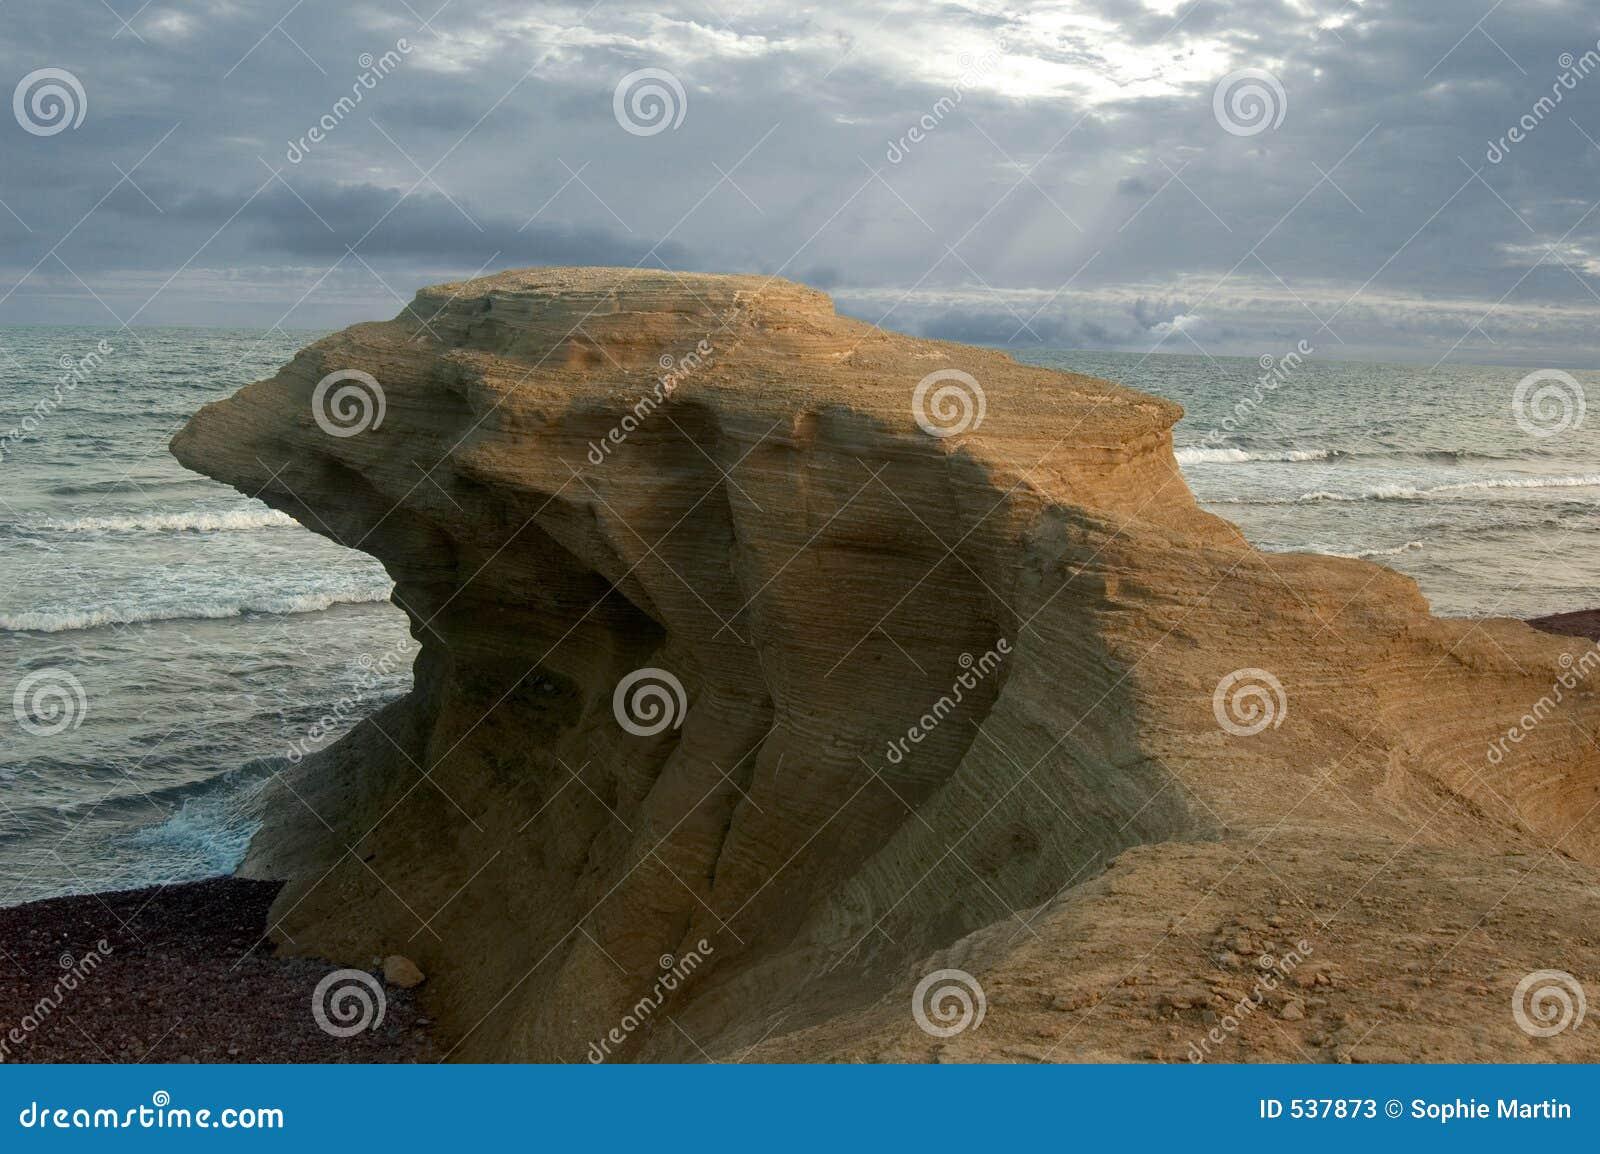 Download 鸟岩石 库存图片. 图片 包括有 火山作用, 石头, 海洋, 火箭筒, 表单, 侵蚀, 横向, 双翼飞机, 旅行 - 537873